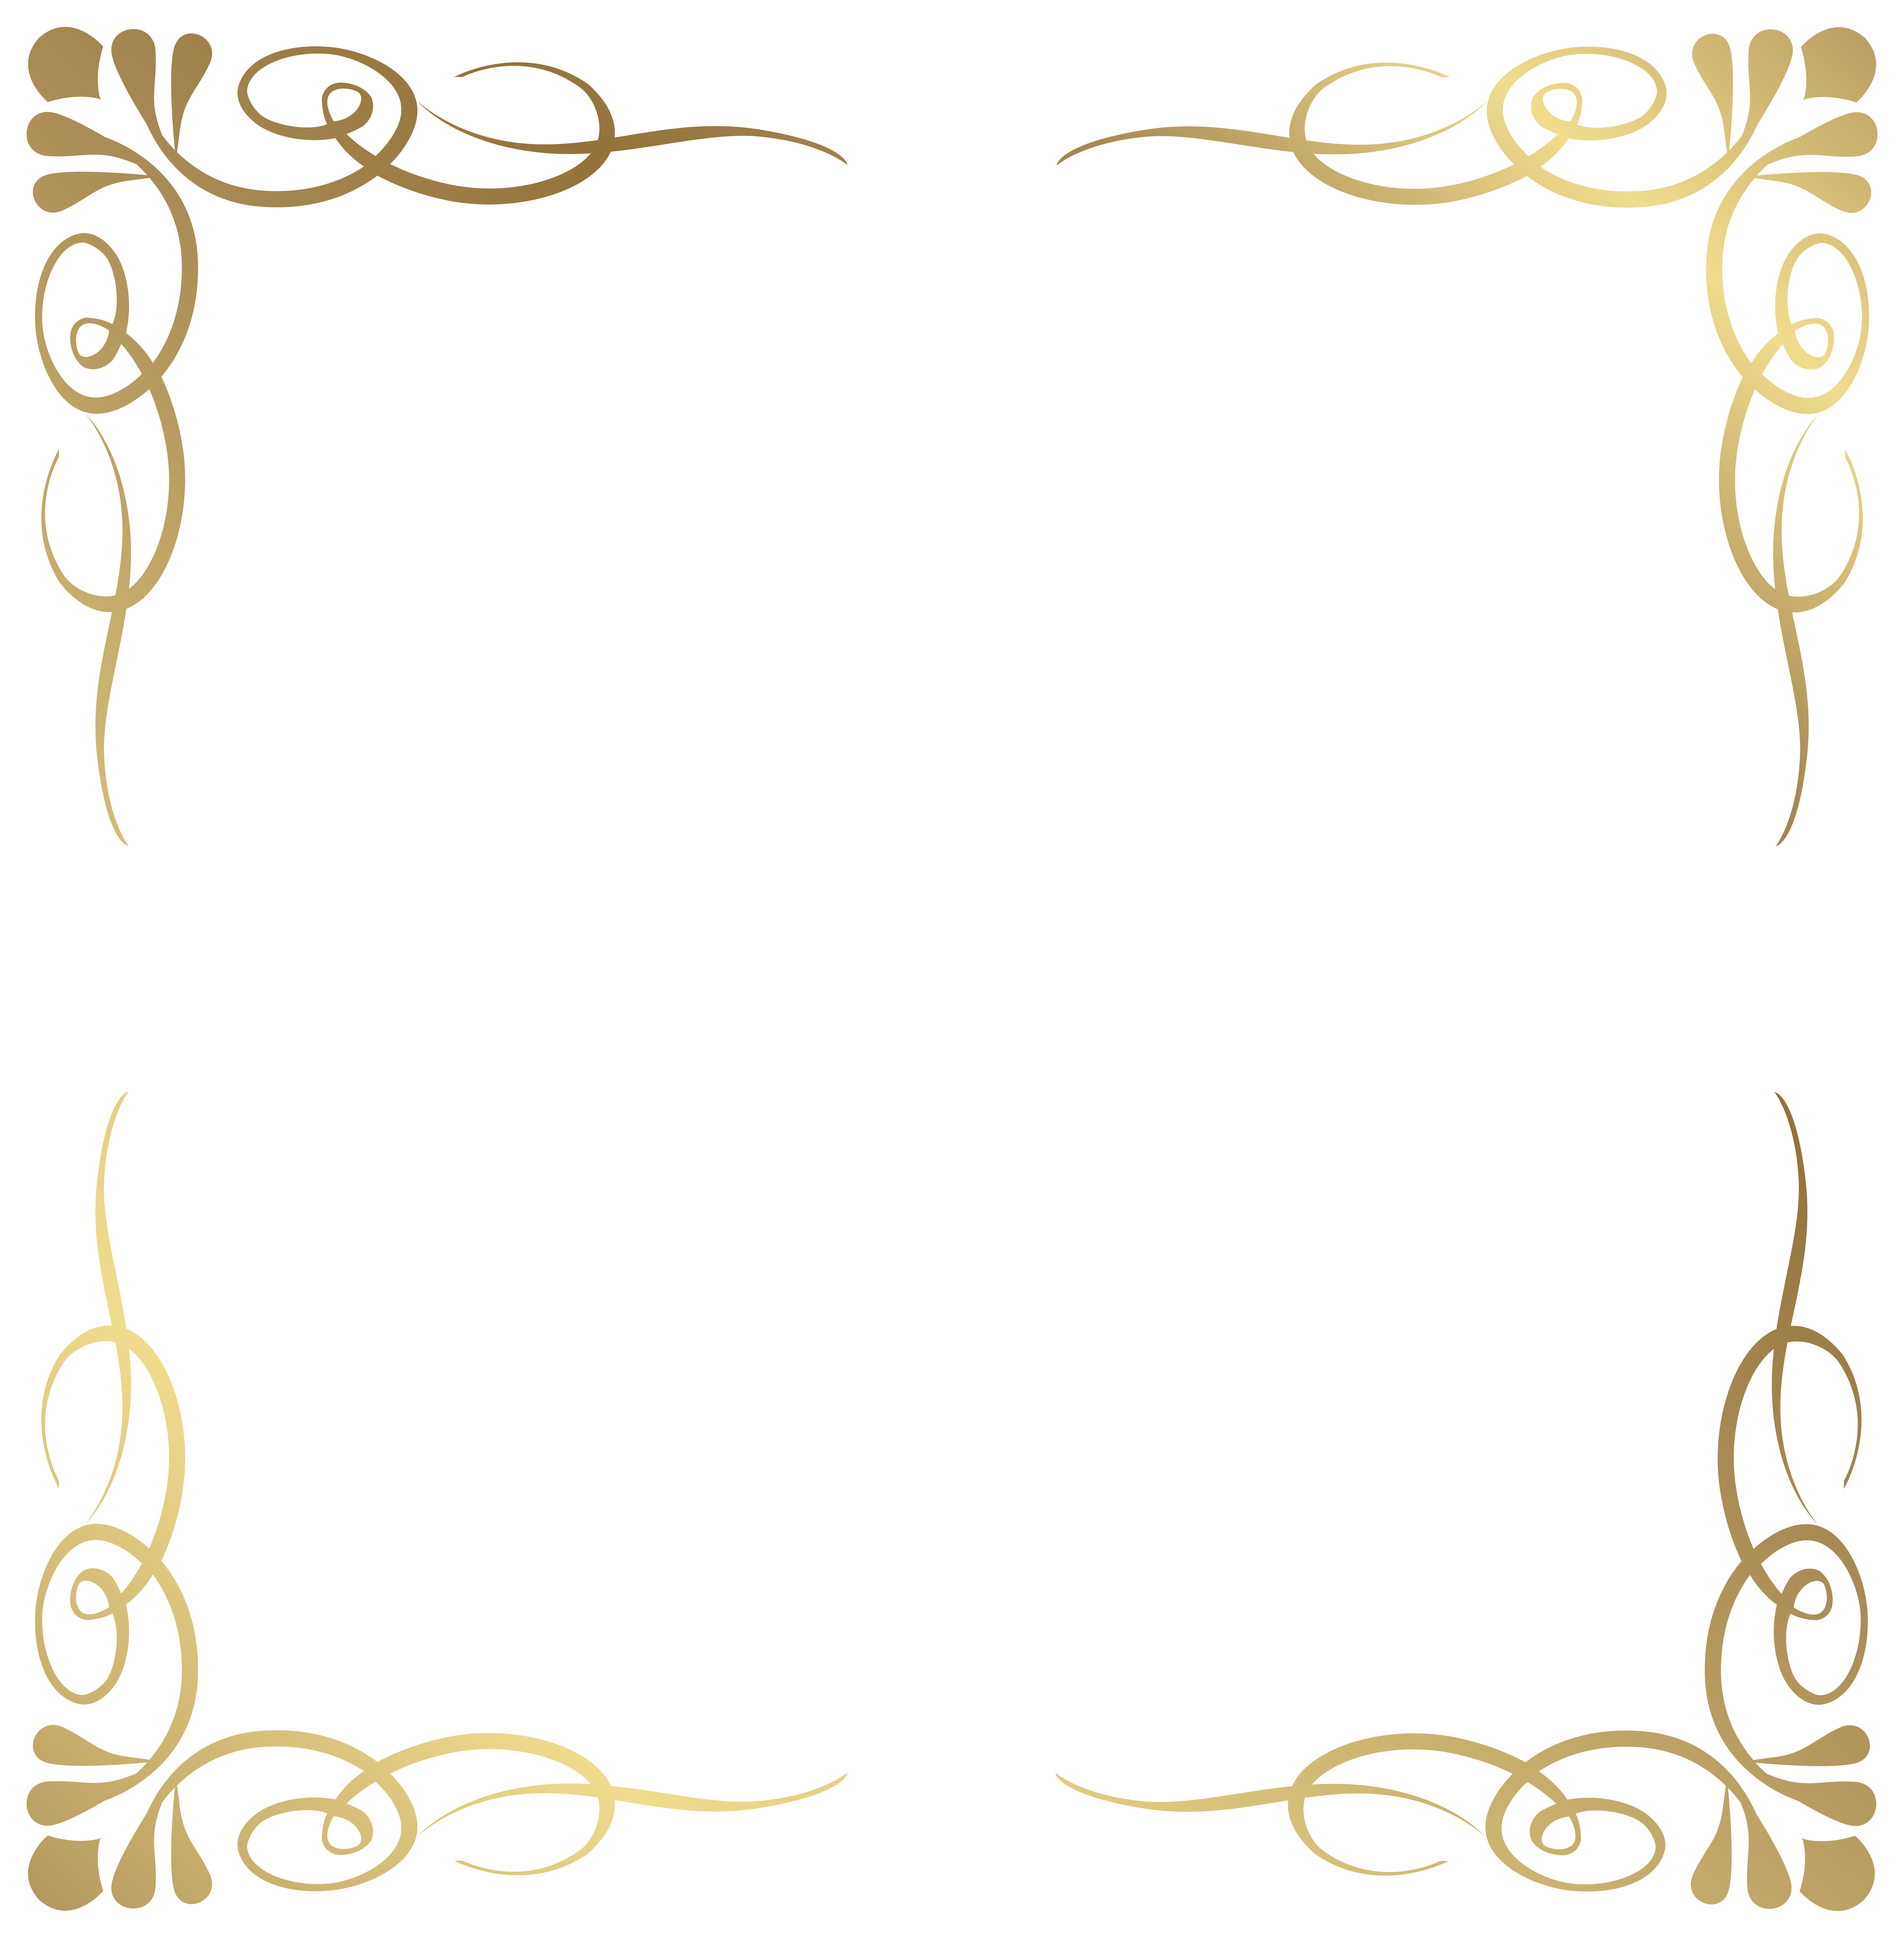 fancy frame border transparent. Transparent Decorative Frame Border PNG Image | Gallery Yopriceville - High-Quality Images And Fancy D